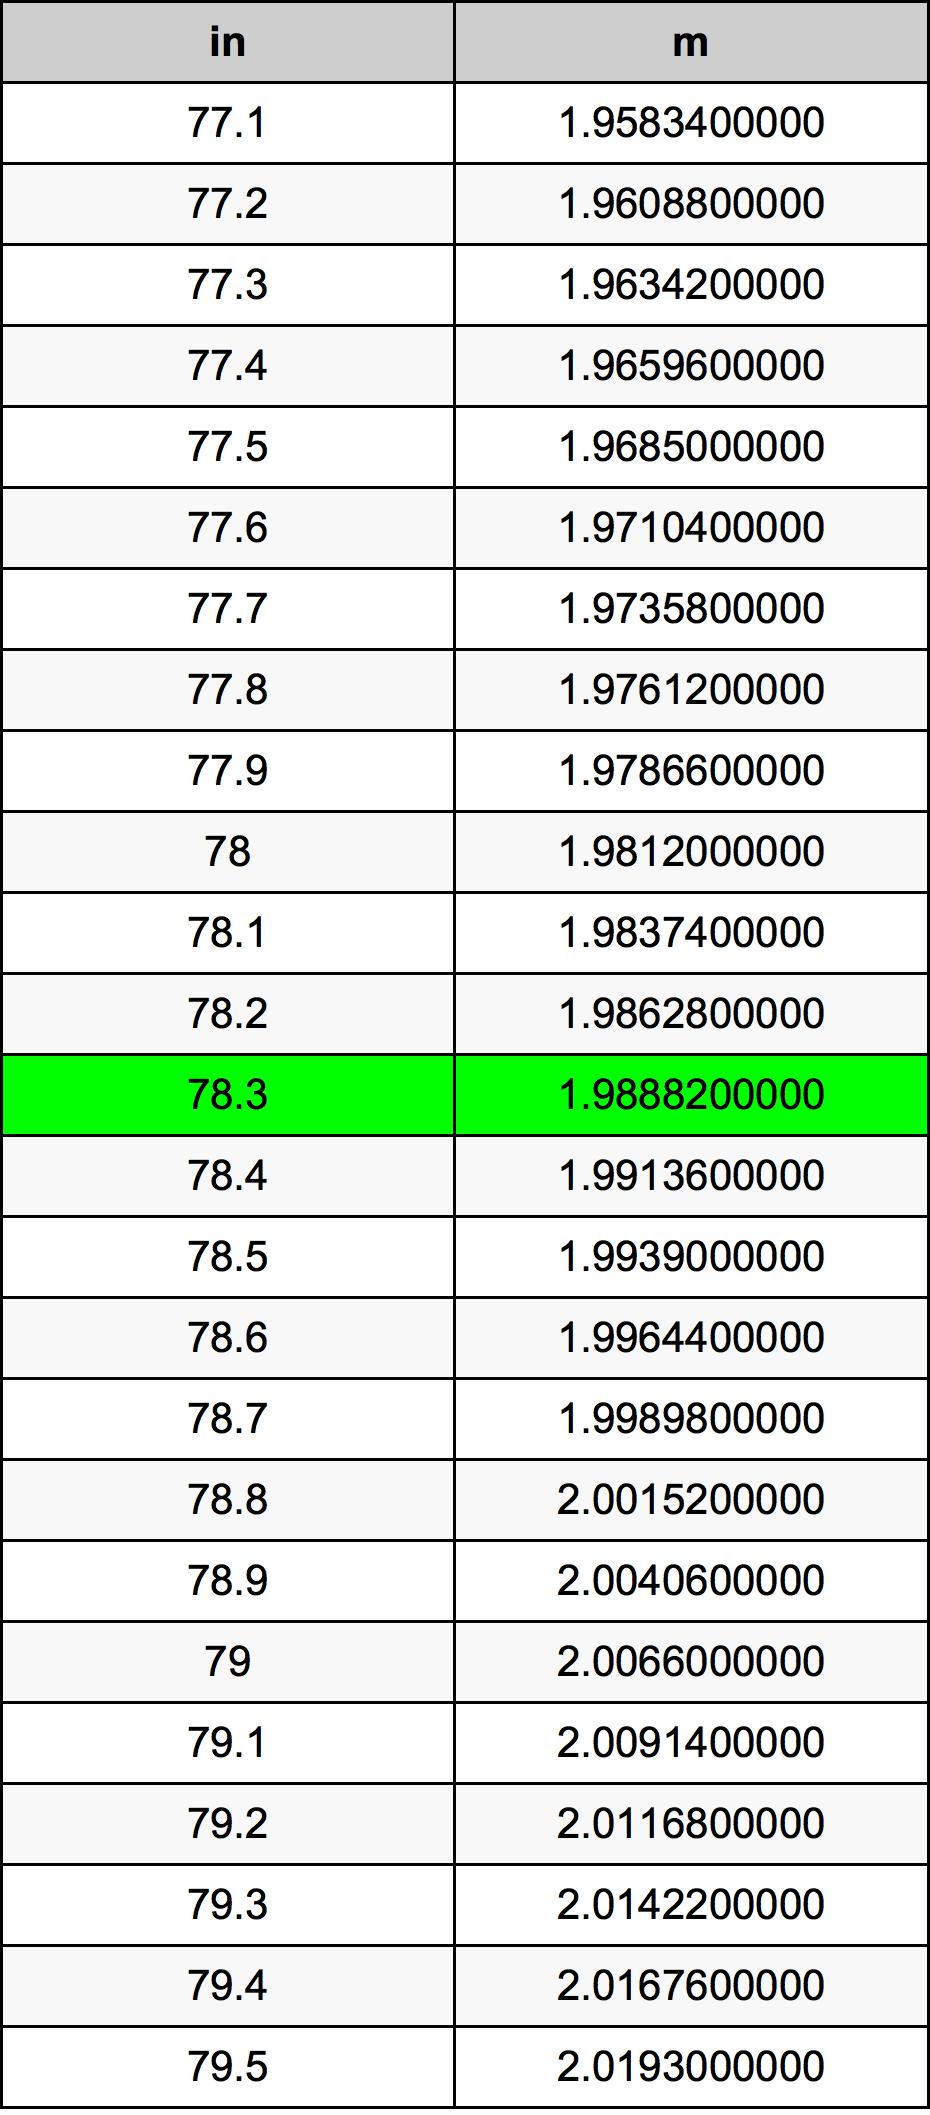 78.3 Inch konverteringstabell